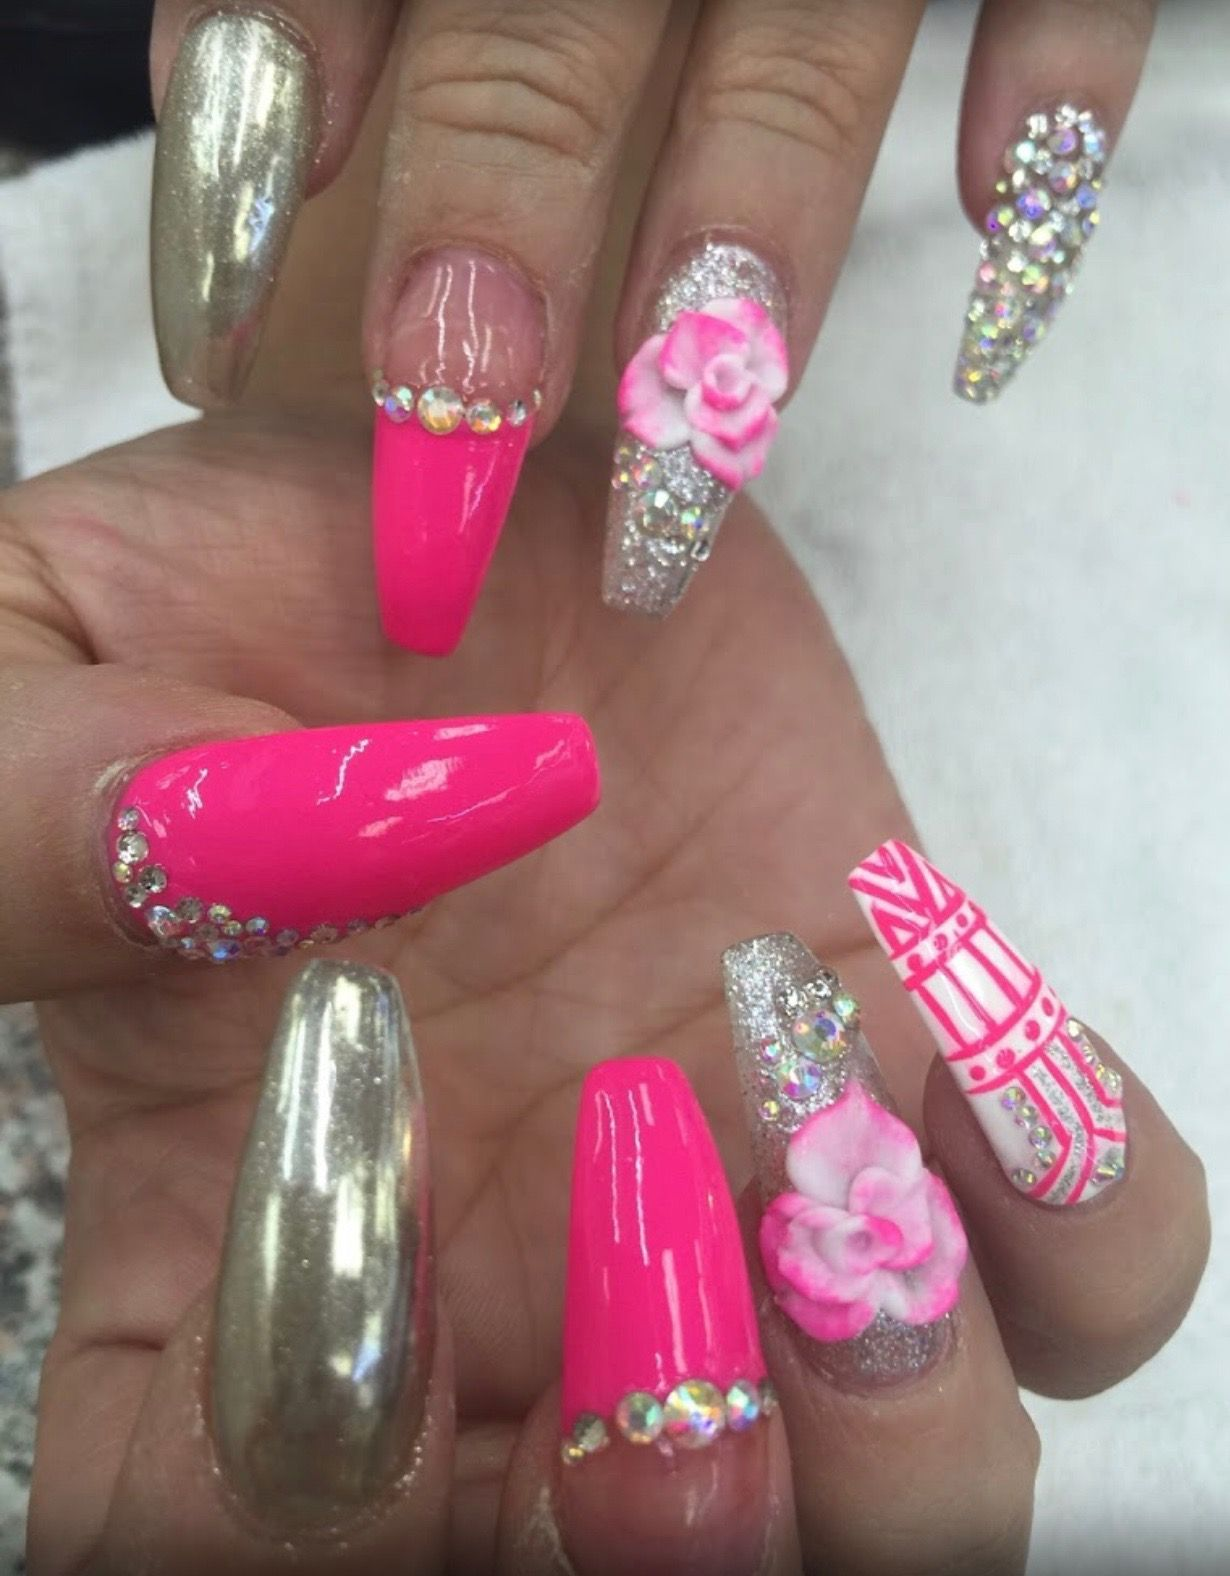 Hot Pink Acrylic Nails Designs Pink Acrylic Nails Pink Acrylic Nail Designs Airbrush Nails